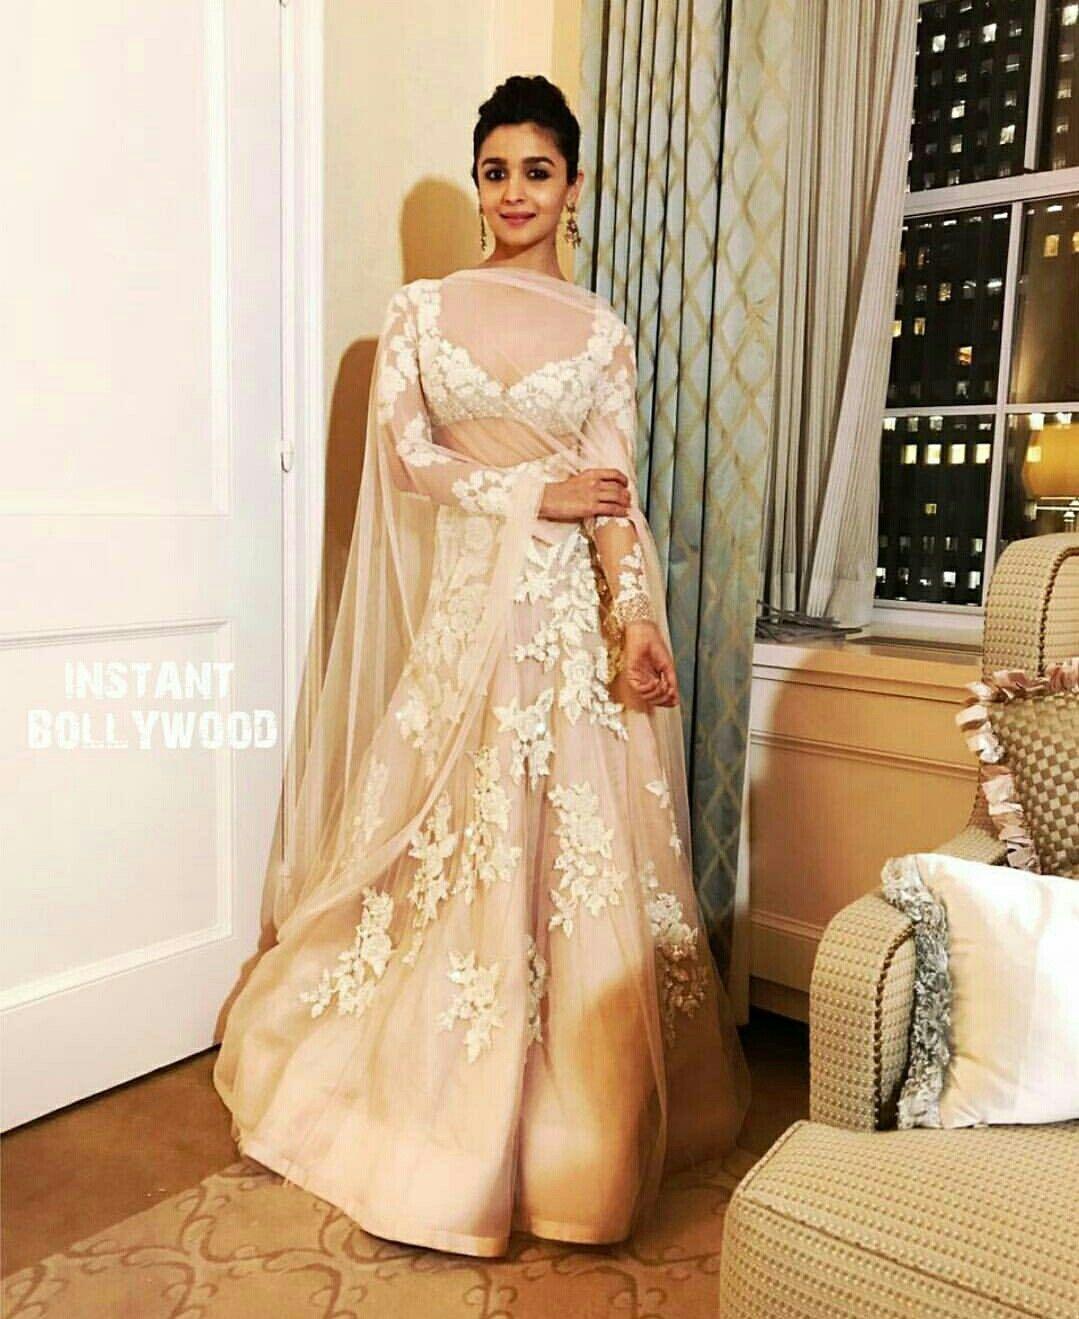 Alia at IIFA 2017 - Manish Malhotra lengha | India ...